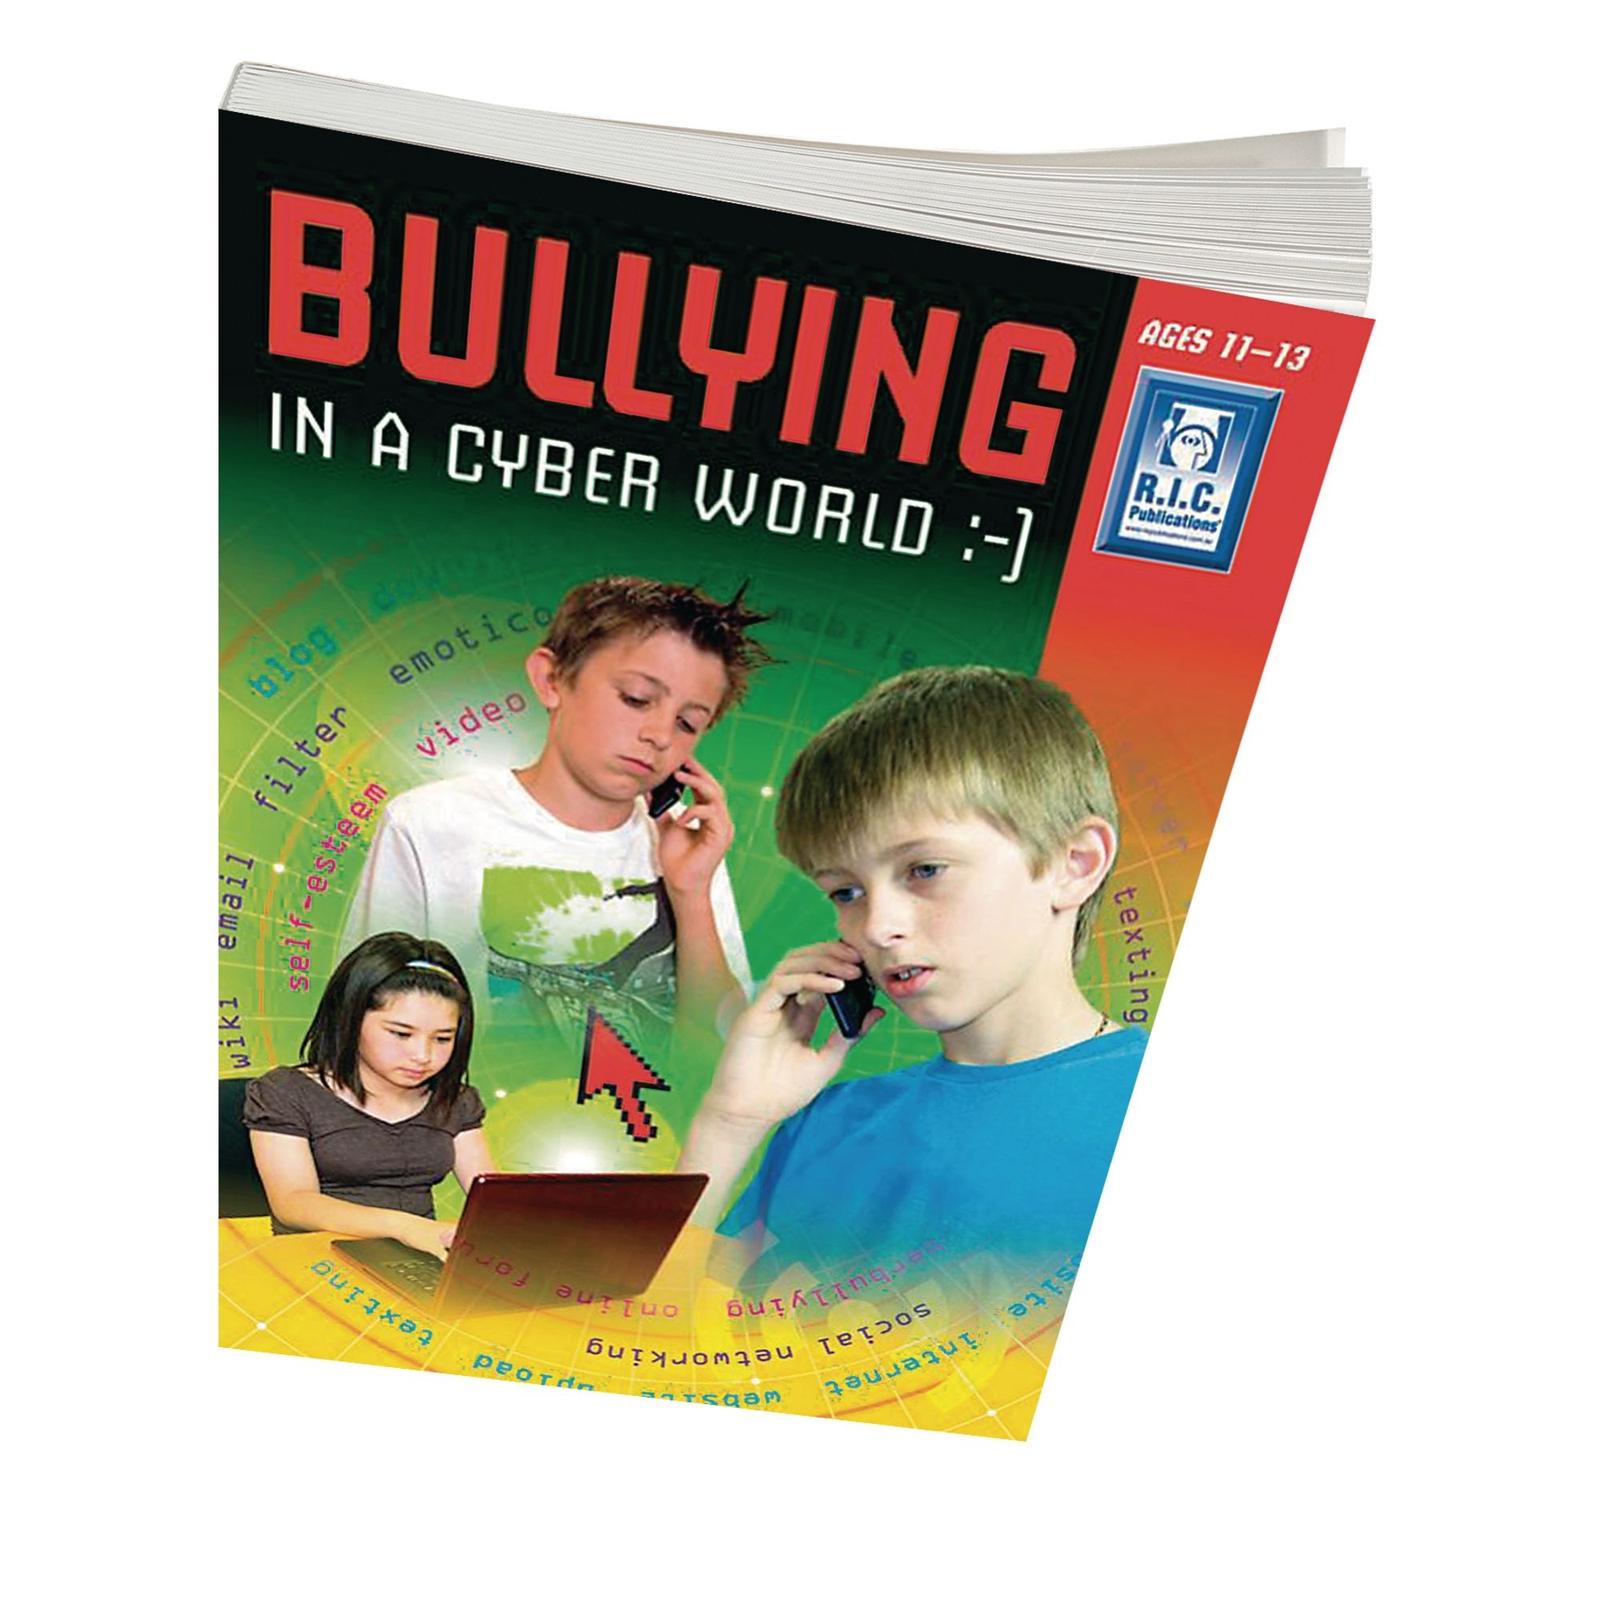 Bullying In a Cyber World - Upper